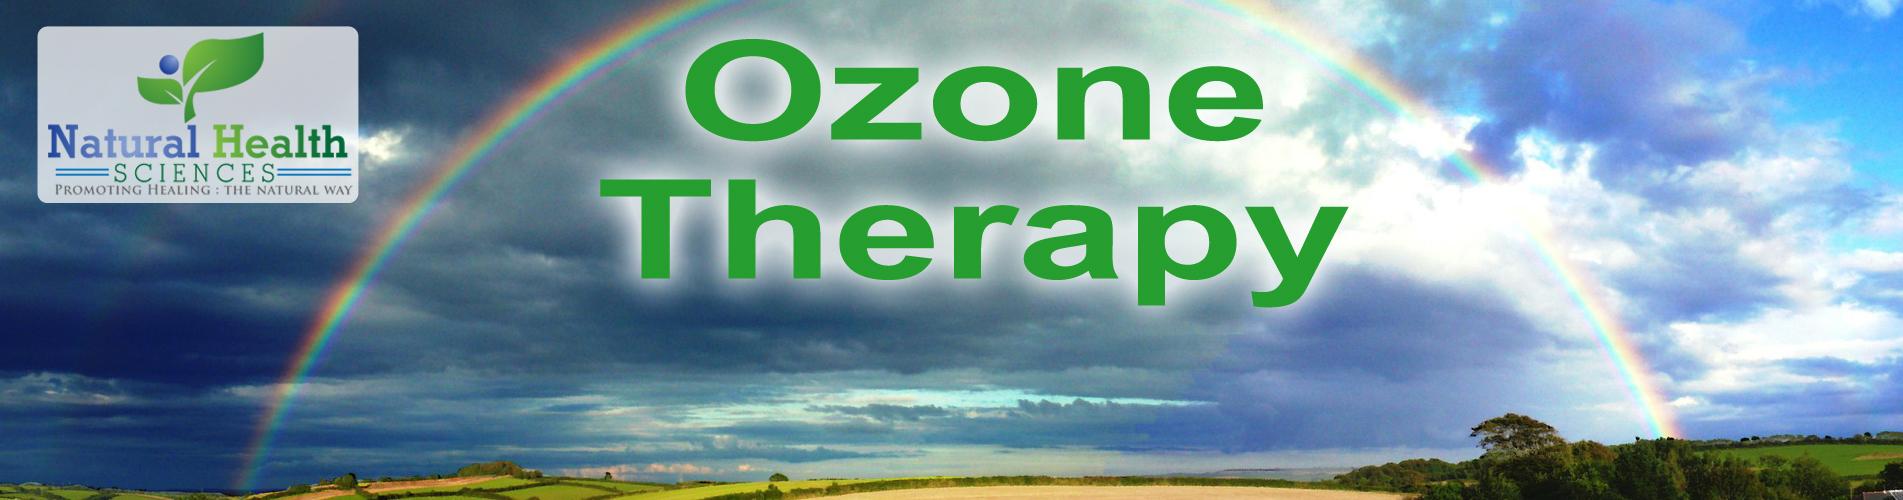 natural-health-sciences-arizona-ozone-therapy